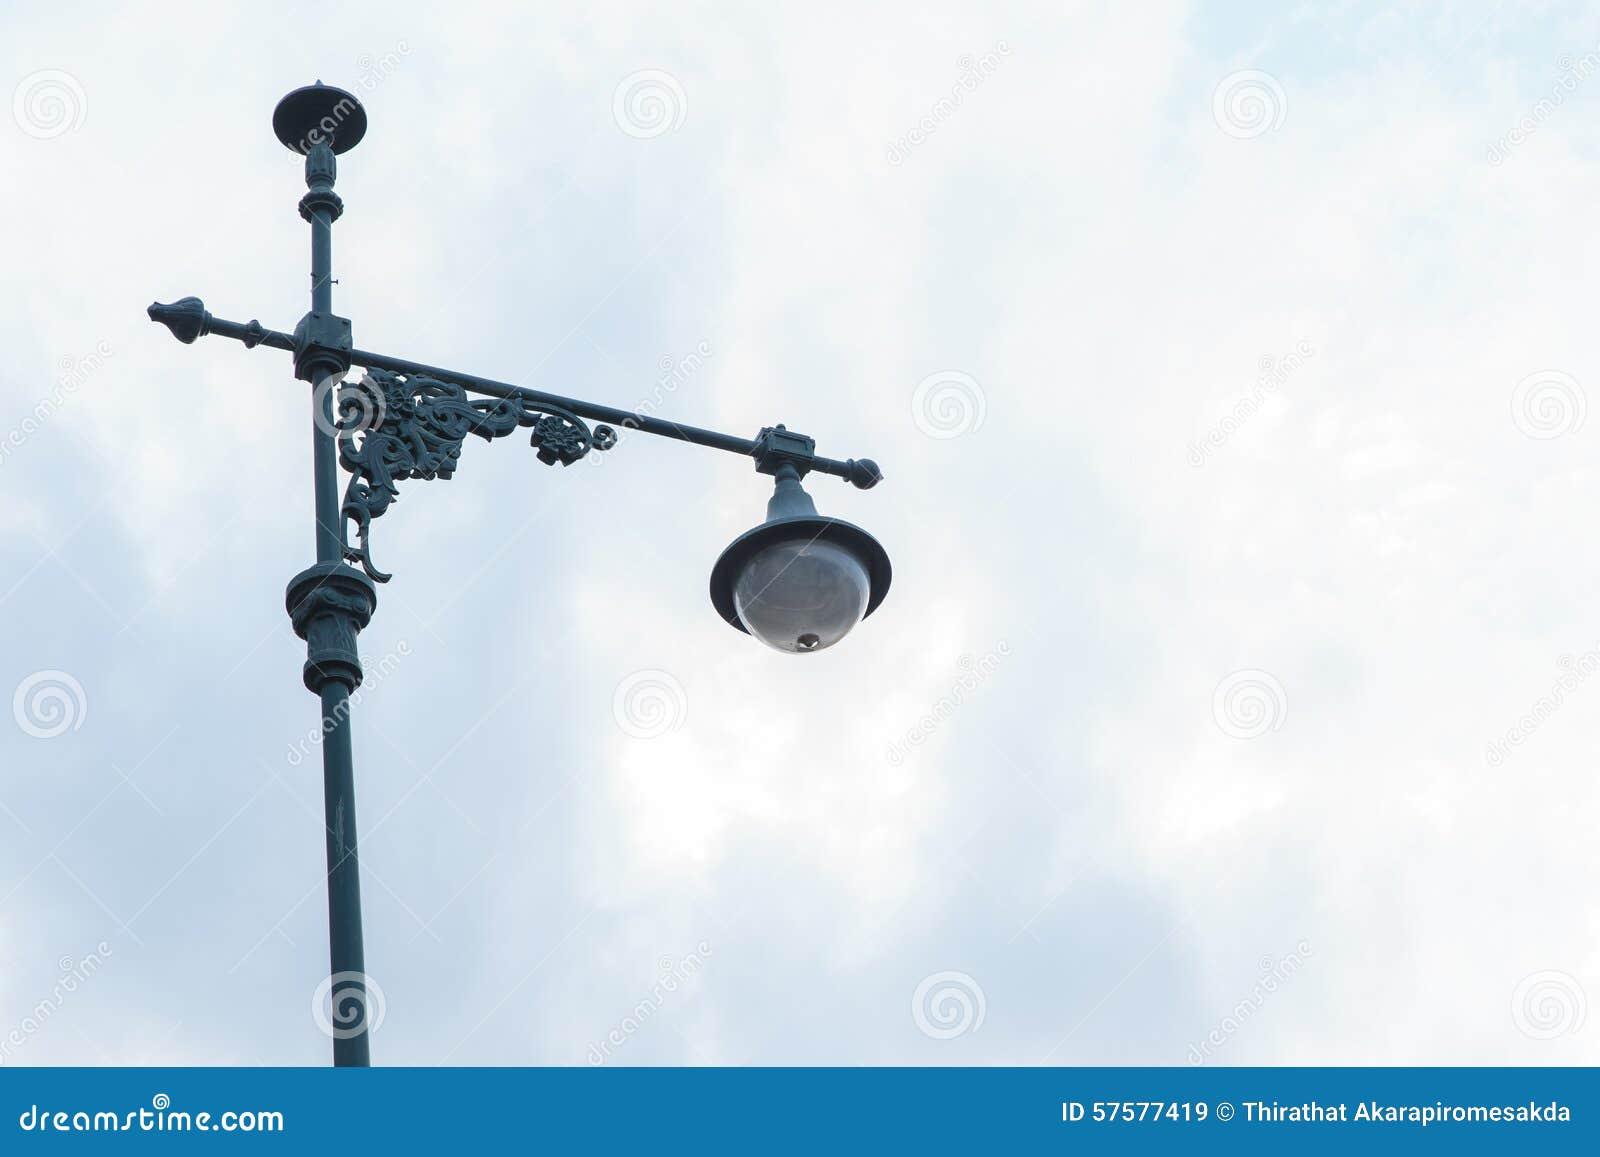 vintage street lights stock image image of road lamppost 57577419